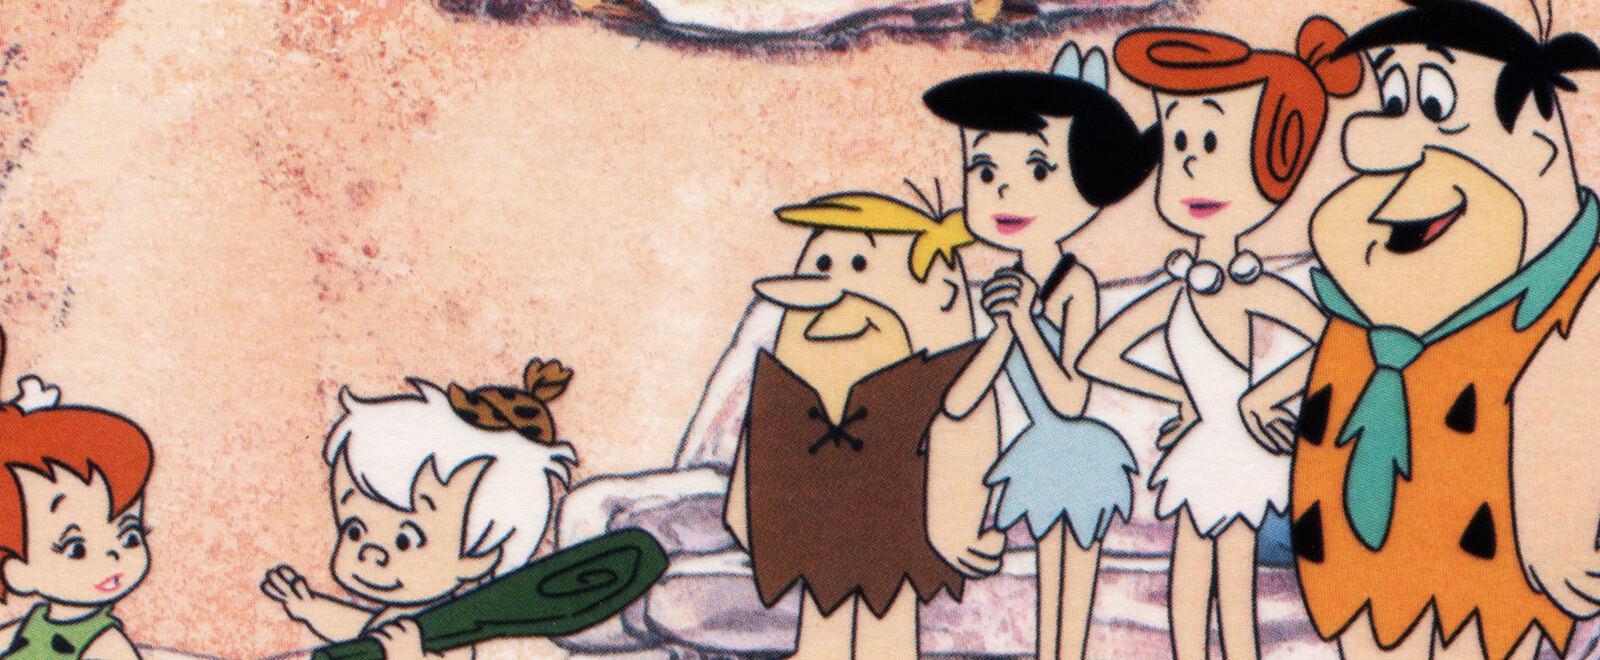 I Flintstone